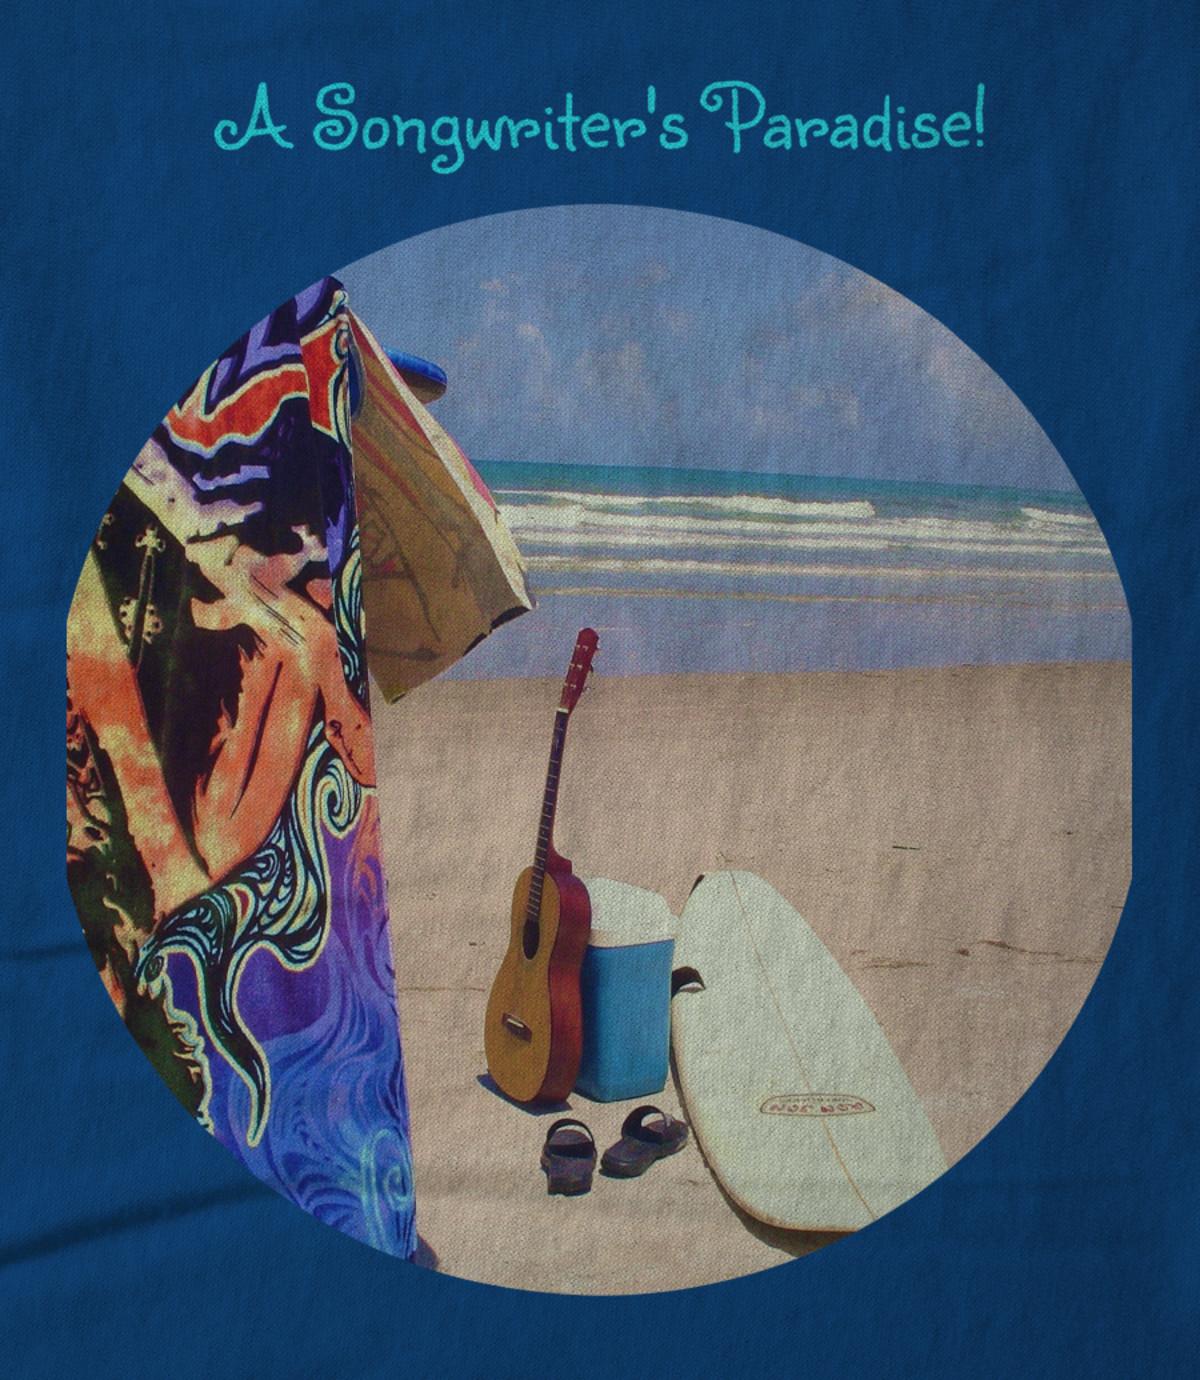 Matthew f  blowers iii a songwriter s paradise  1505318285